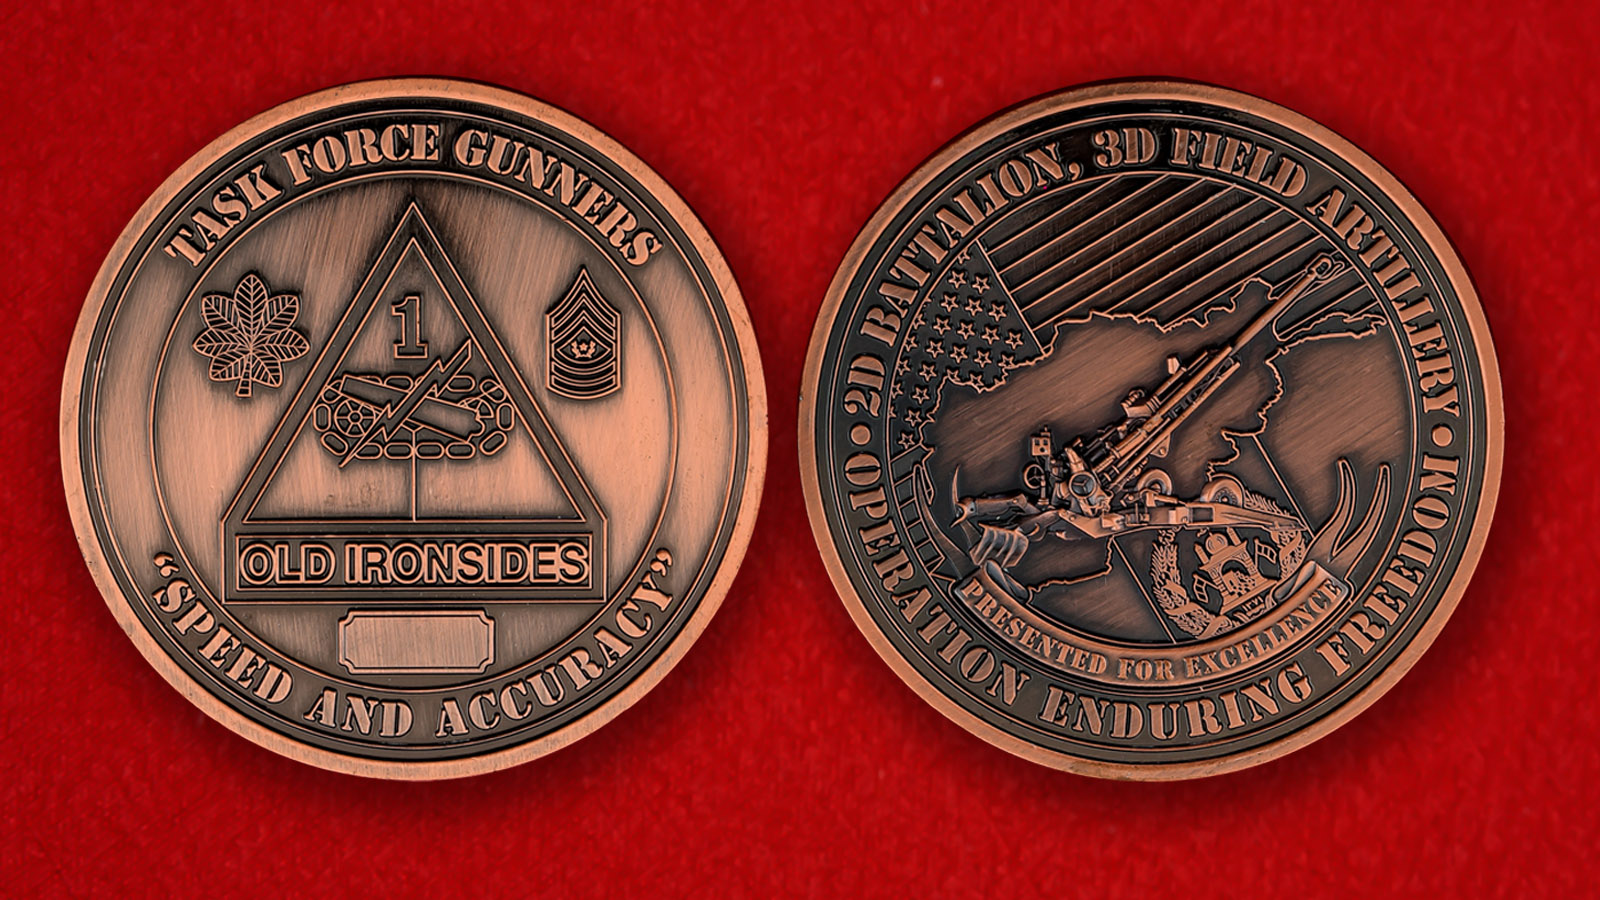 Челлендж коин 2-го батальона 3-го полка полевой артиллерии армии США